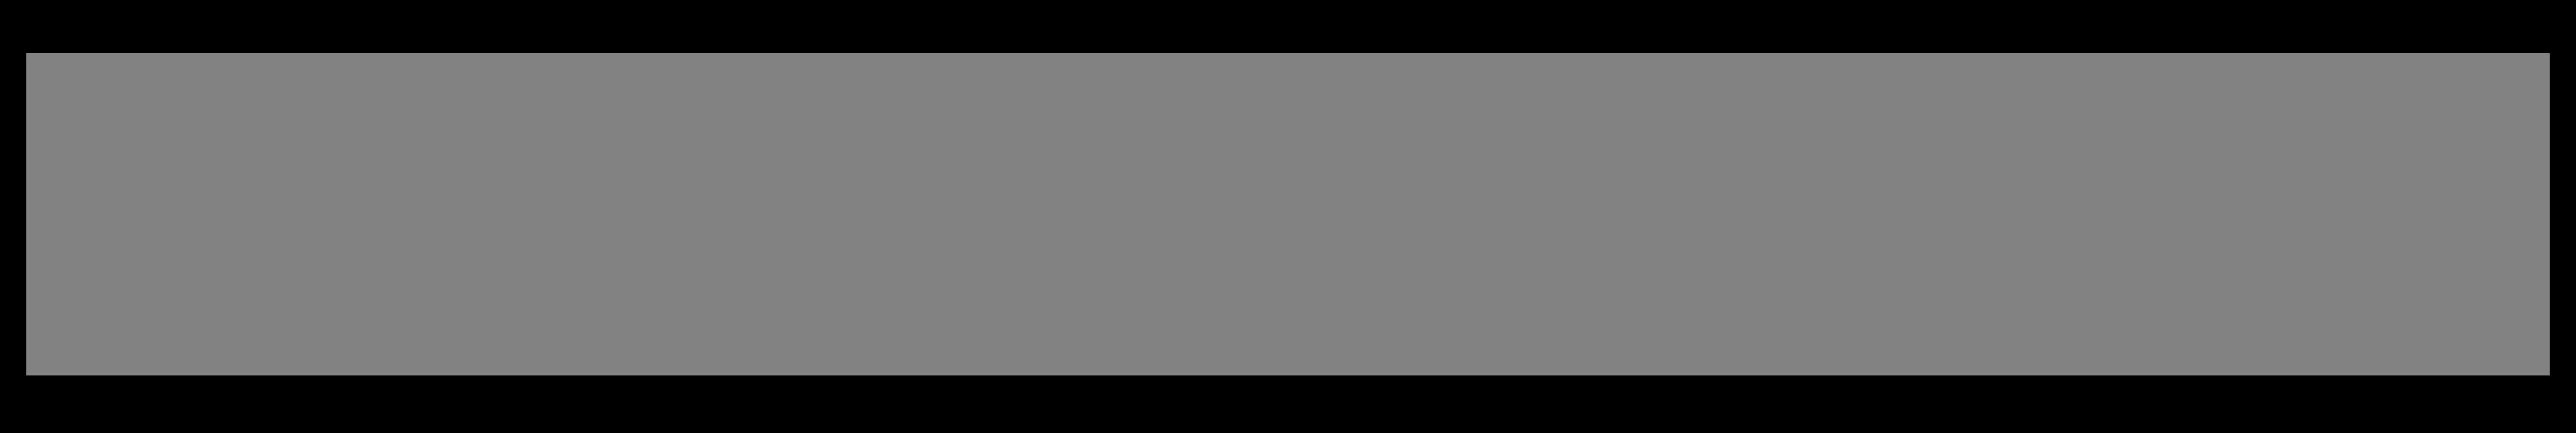 BorgWarner_logo.png